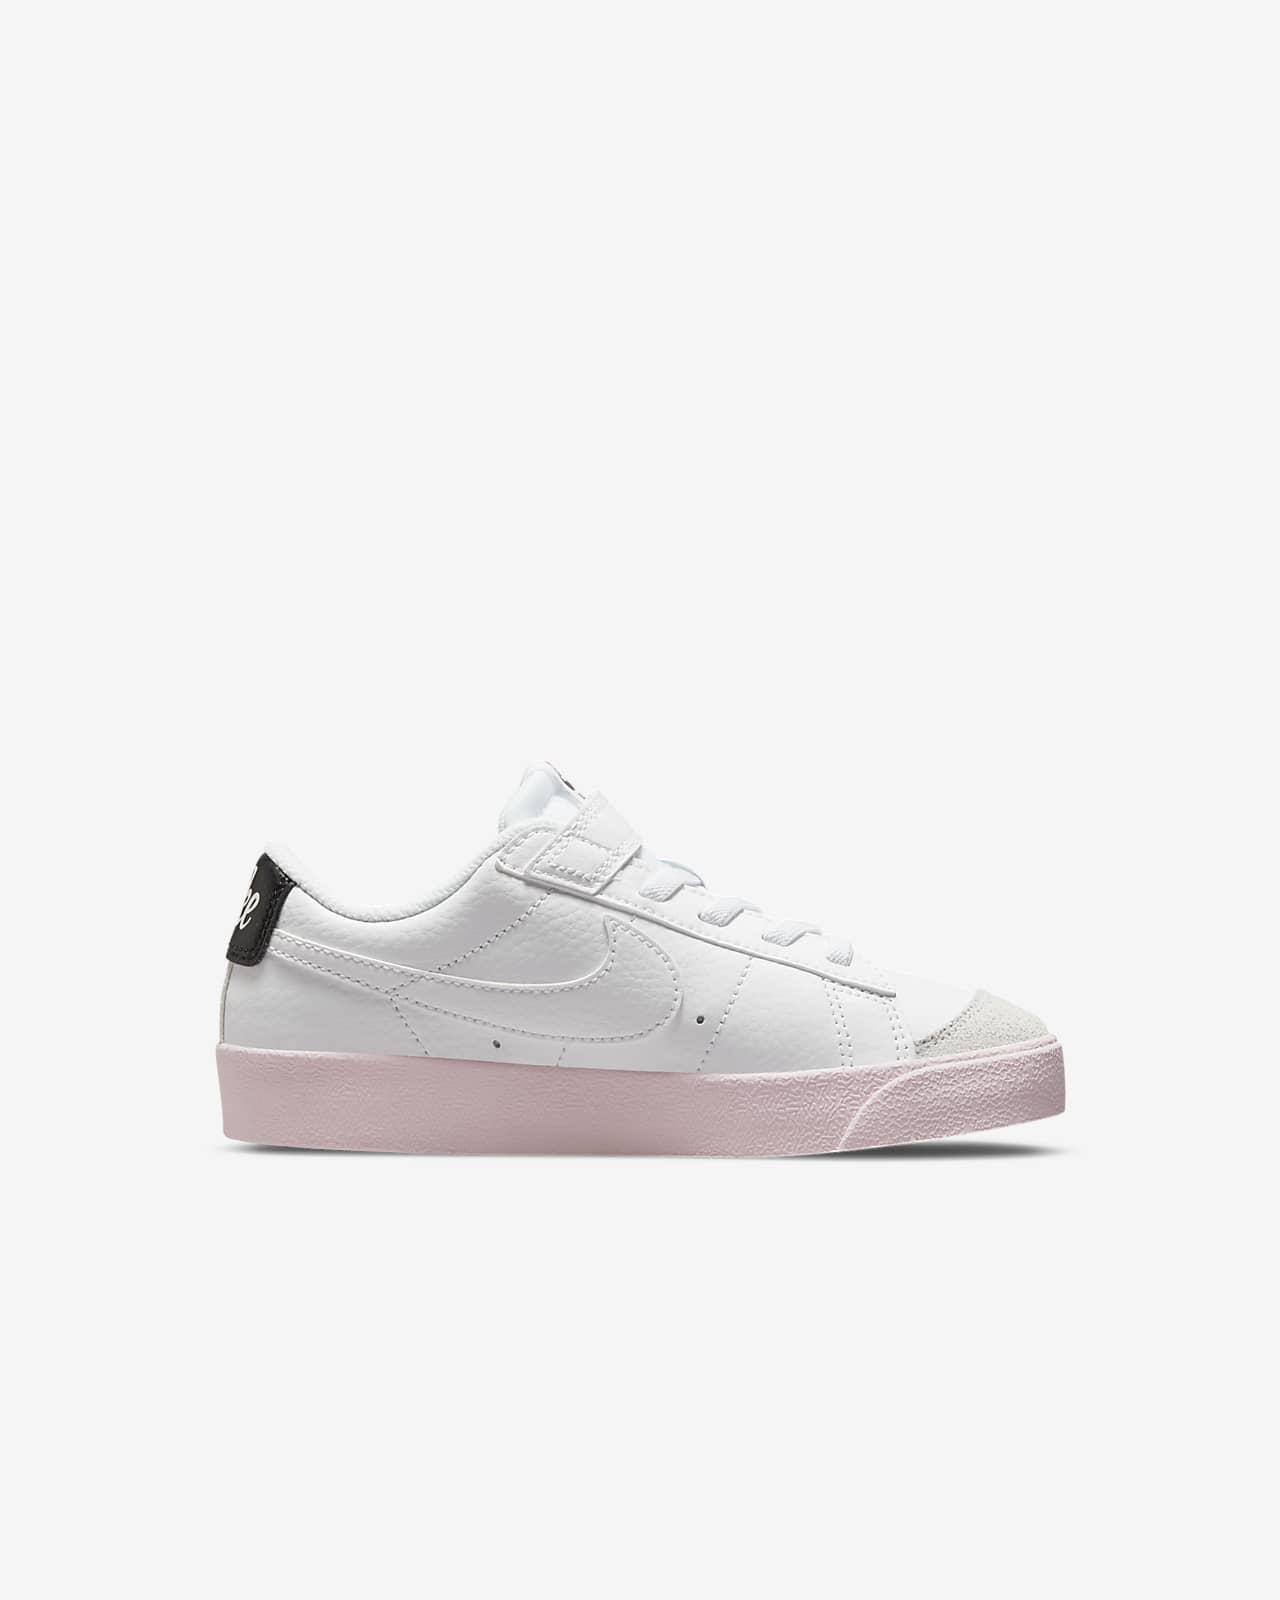 Chaussure Nike Blazer Low '77 BeTrue pour Jeune enfant. Nike LU